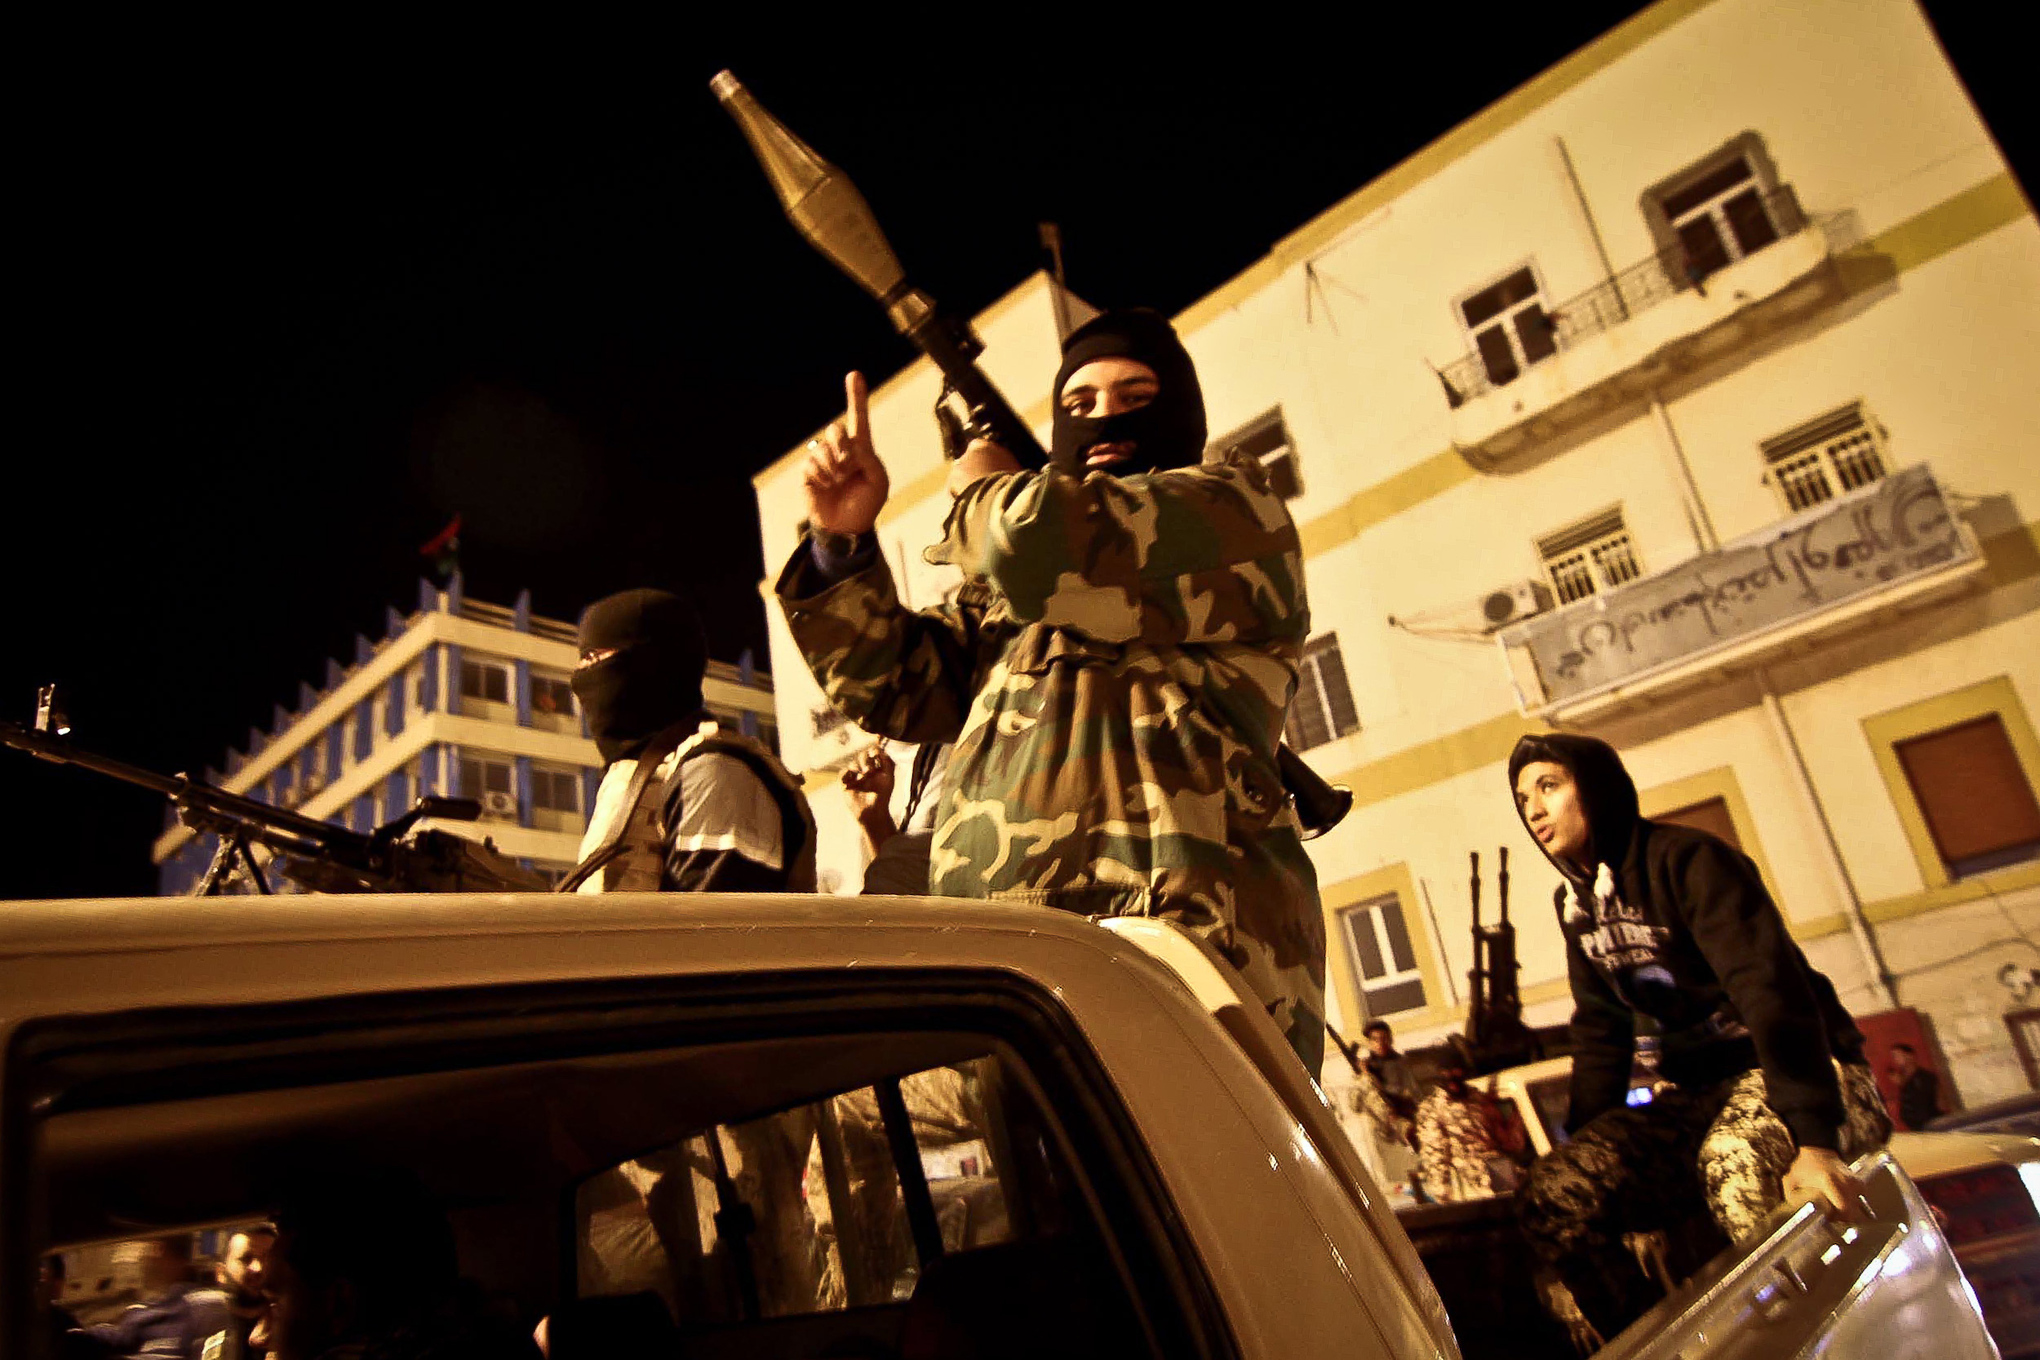 Libyan_militia_february_mohamed_elshaiky_anadolu_agency_getty_images